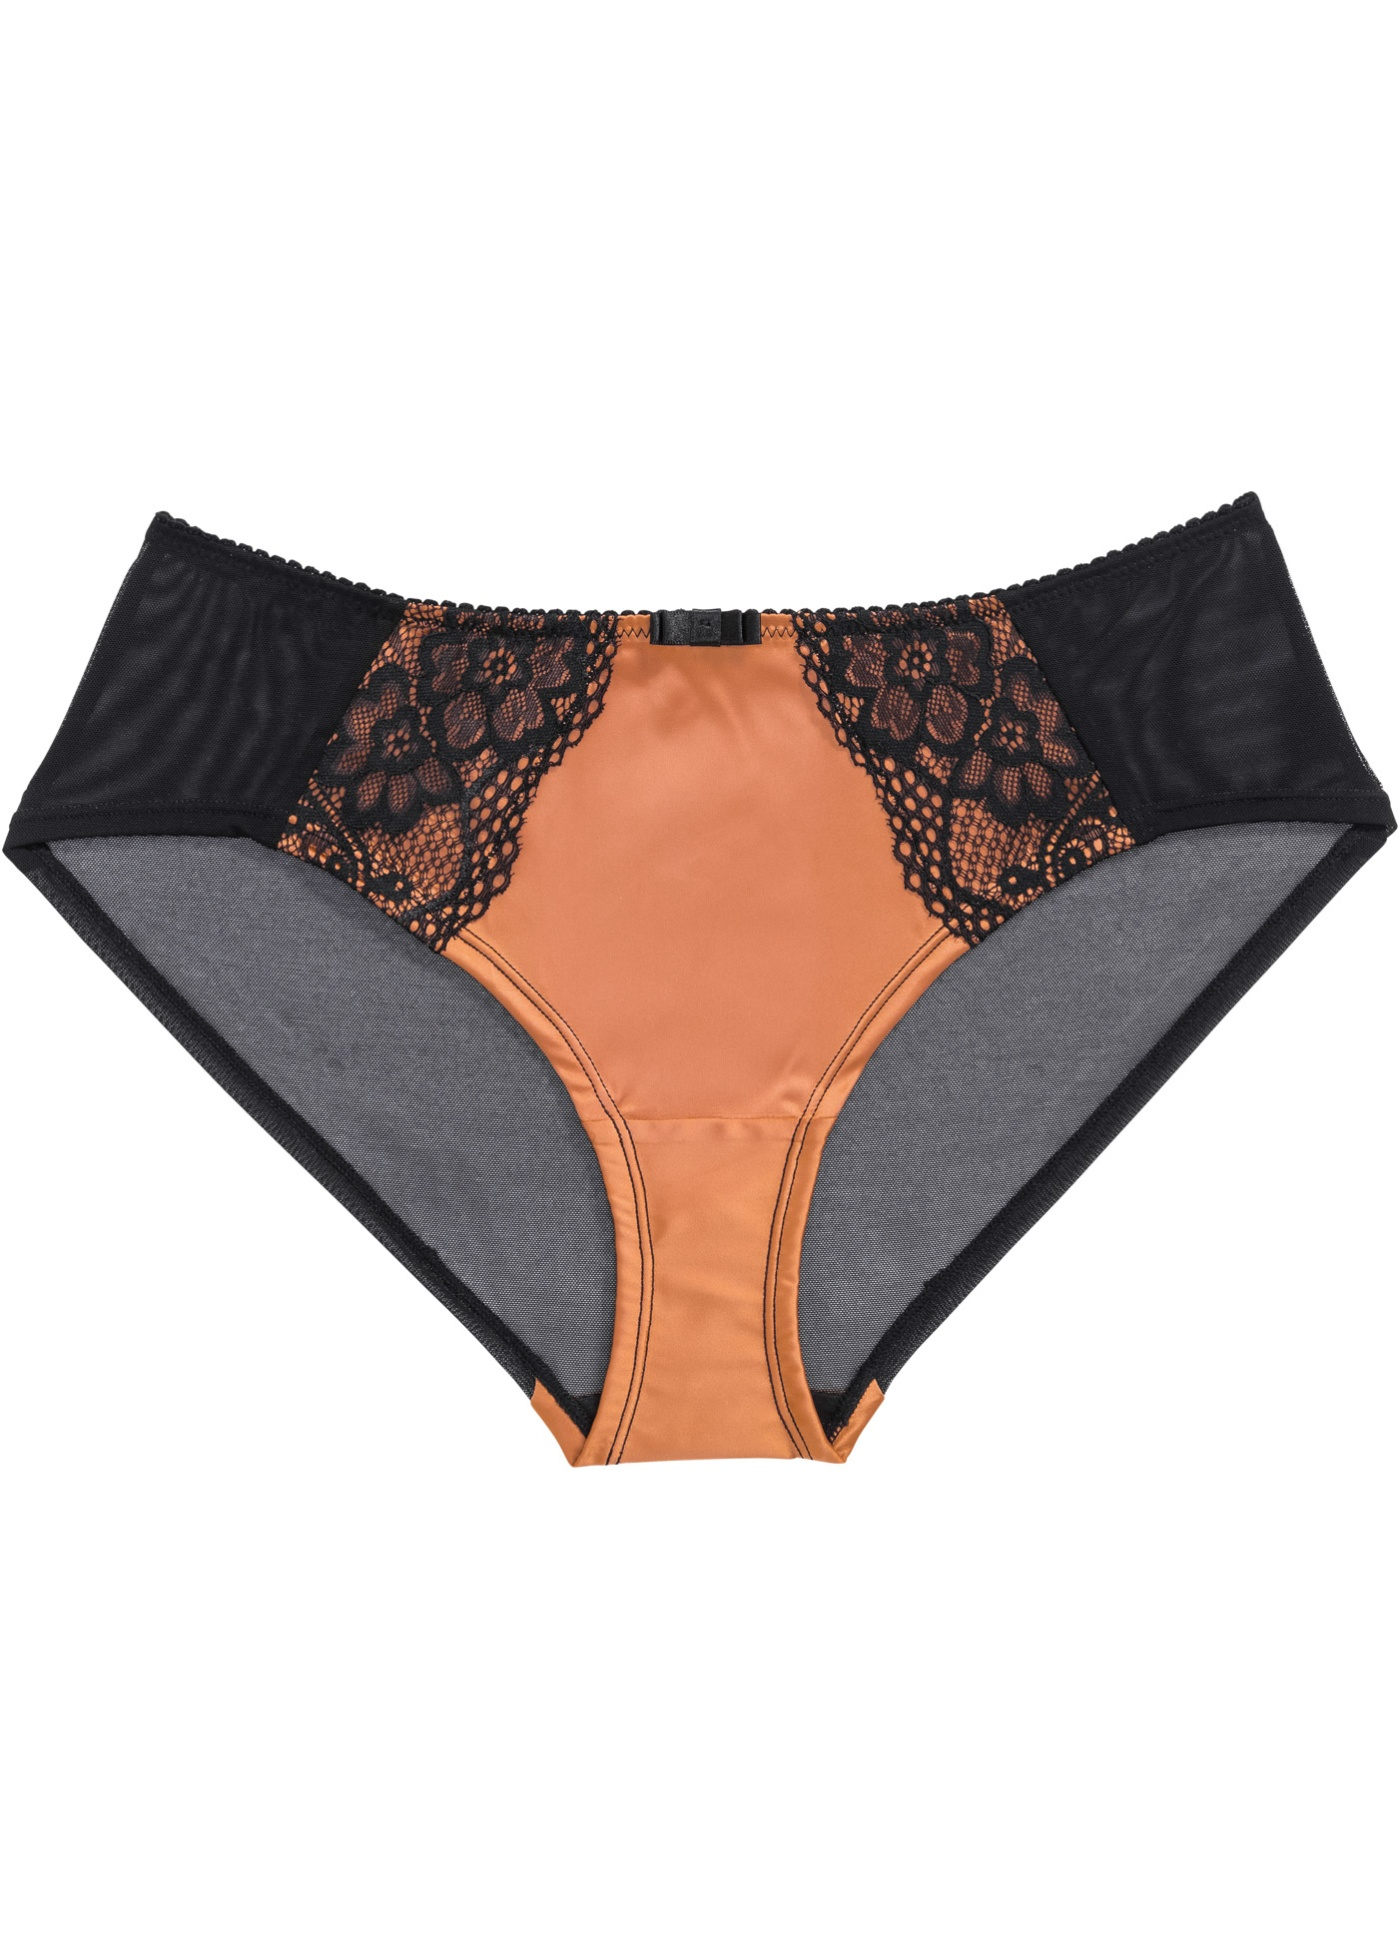 Panty  Arancione  - BODYF